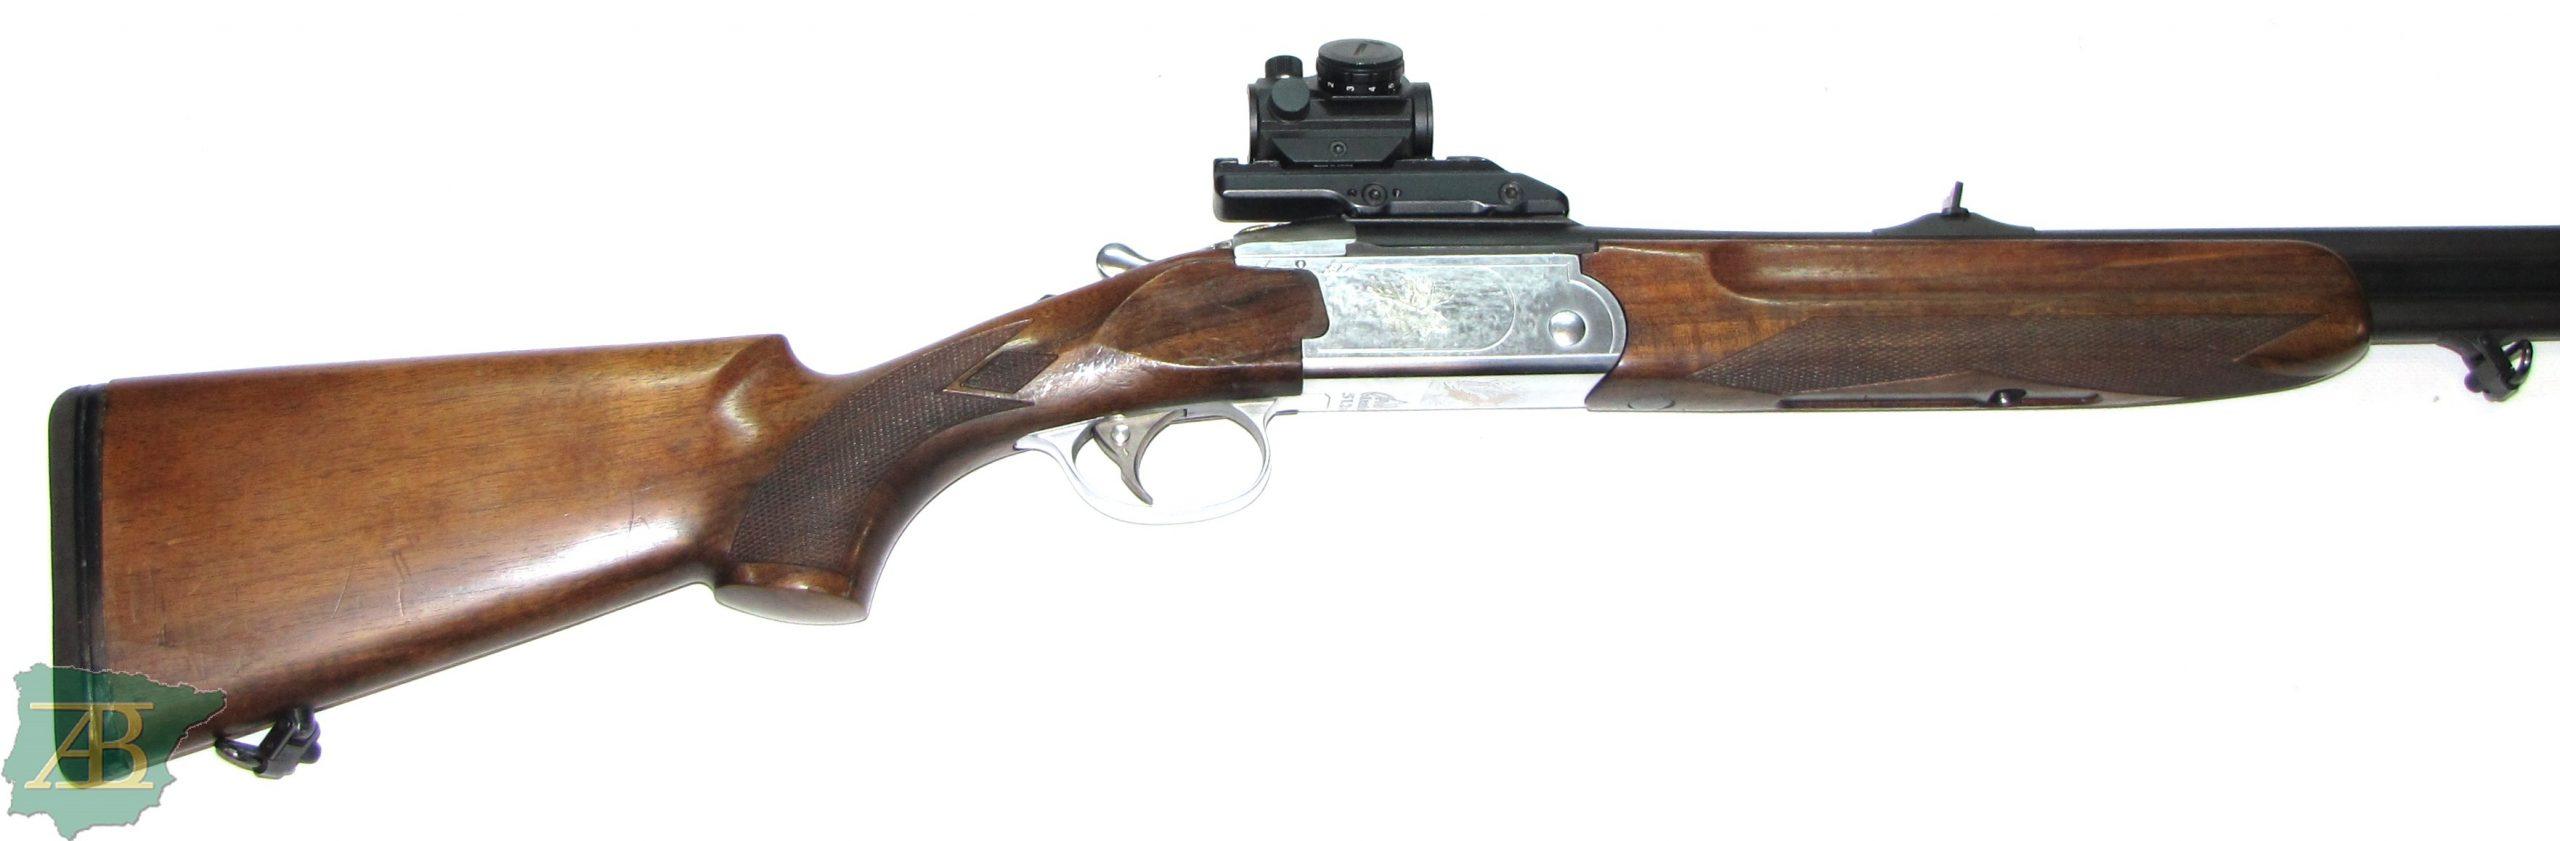 Rifle express FINN CLASSIC 512s Ref REP2020-1041-armeriaiberica-2